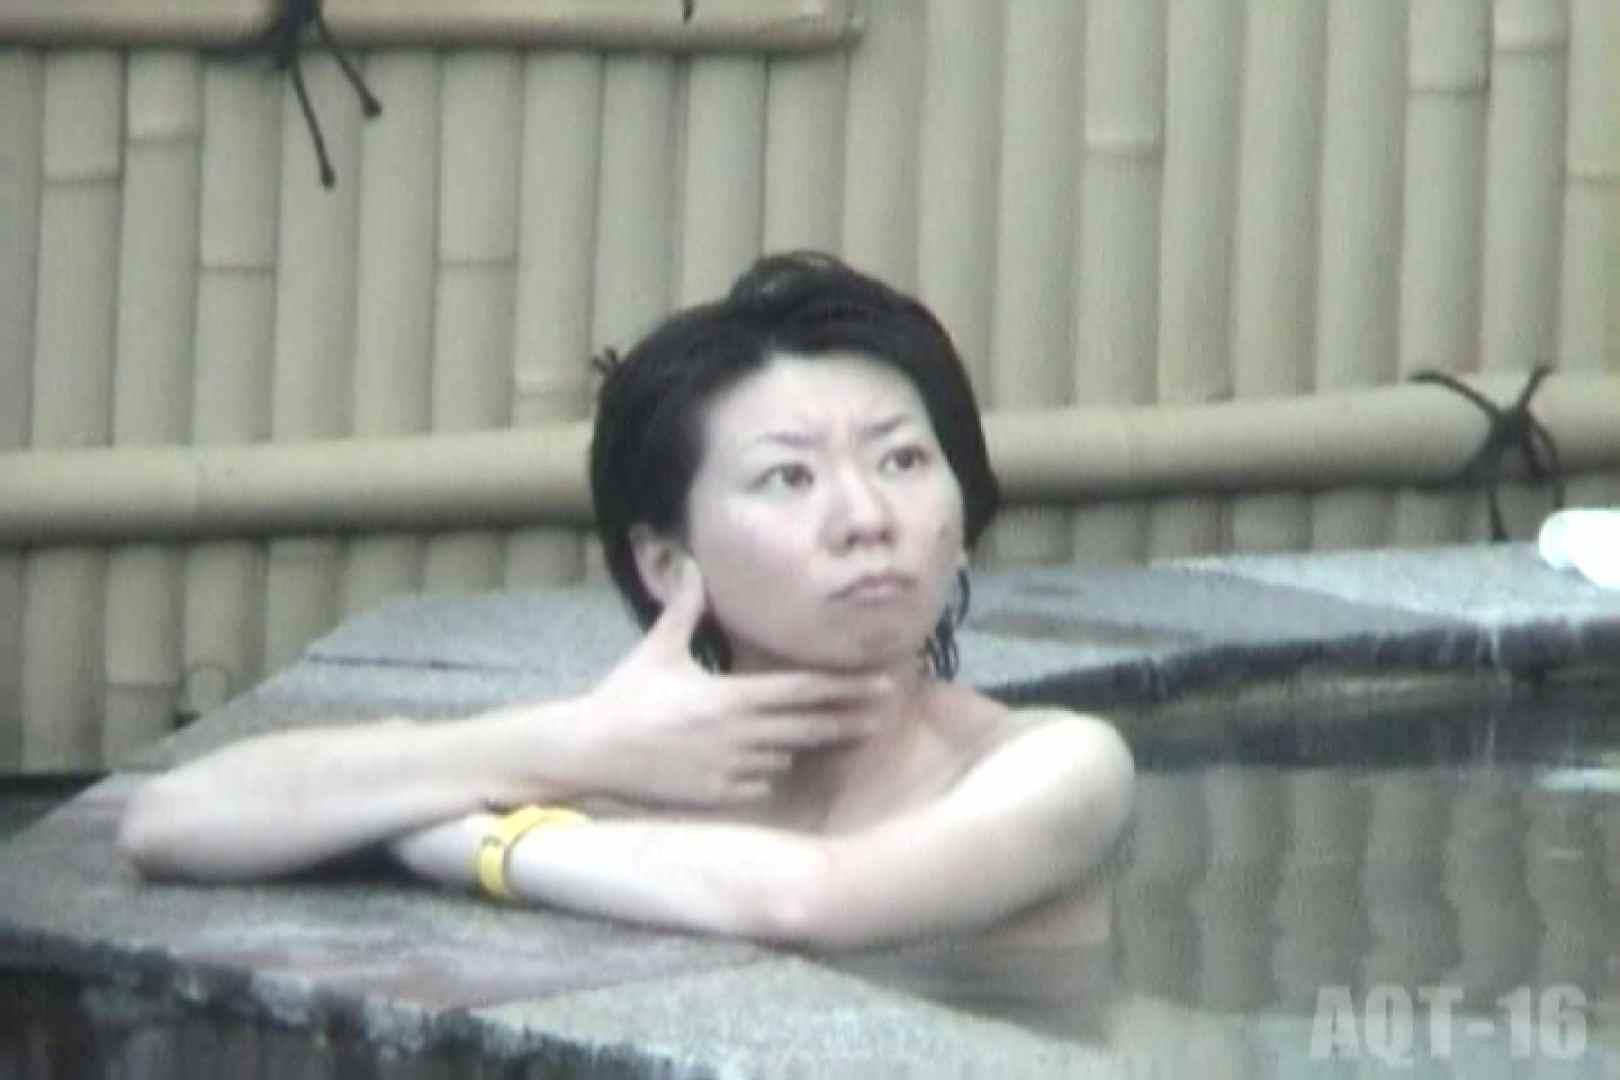 Aquaな露天風呂Vol.842 露天 オメコ無修正動画無料 44連発 44